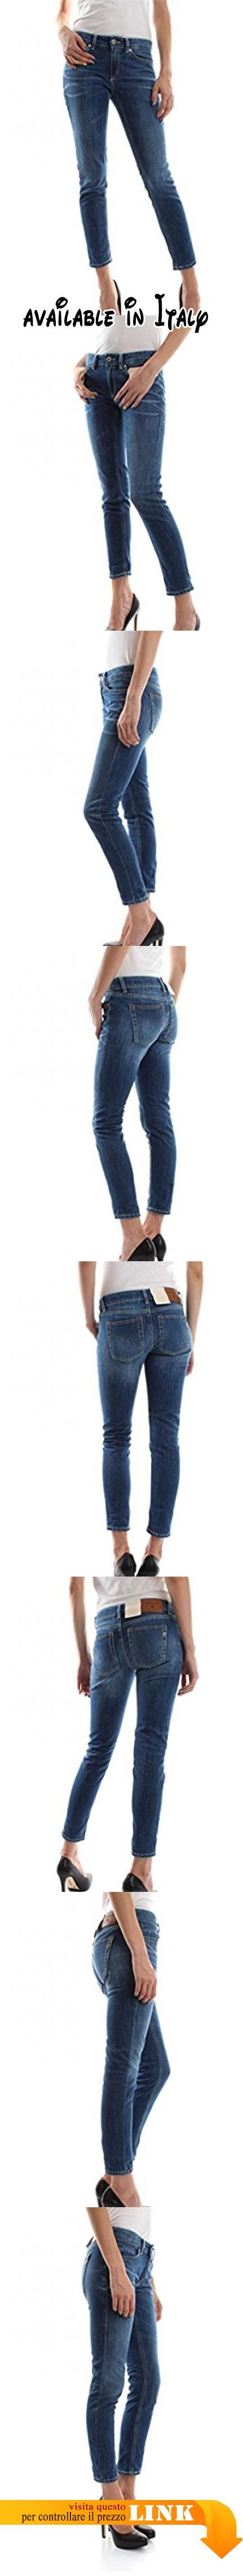 Denim Gaynor Dp238 Ds107d Donna Jeans Medium P51 B074xnvrxc Dondup 0q7nSBw